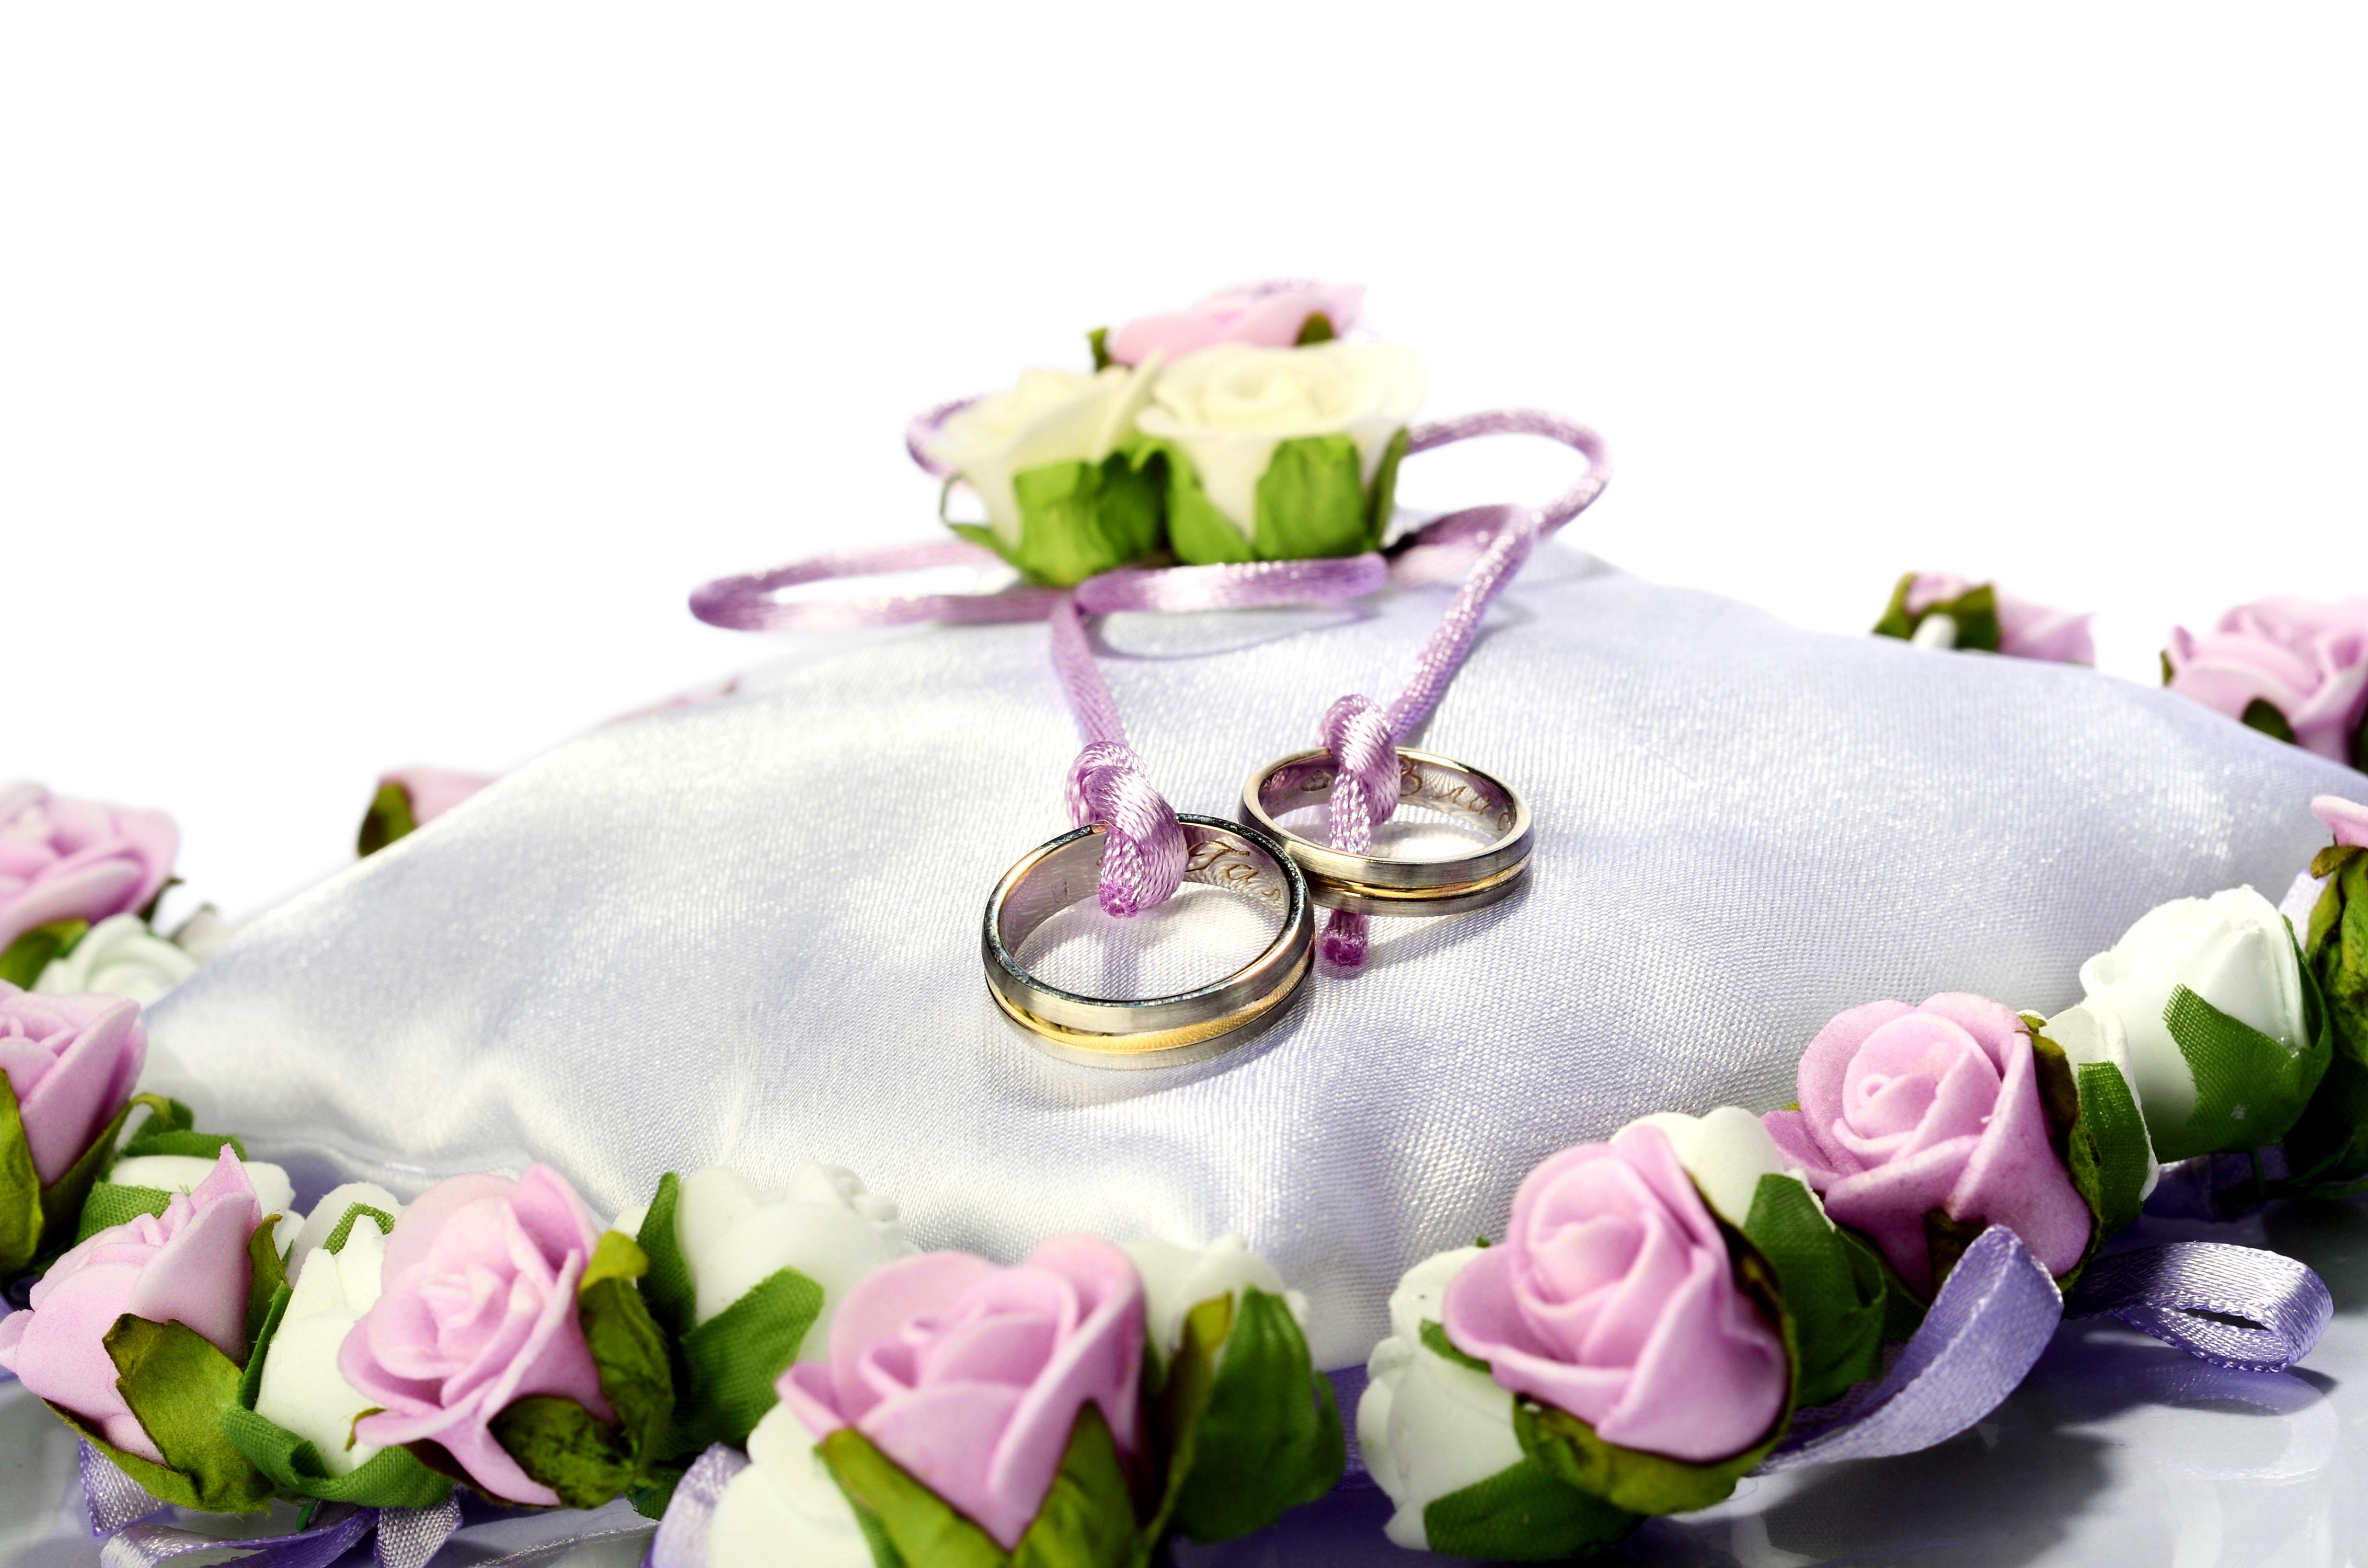 Фото с кольцами и цветами